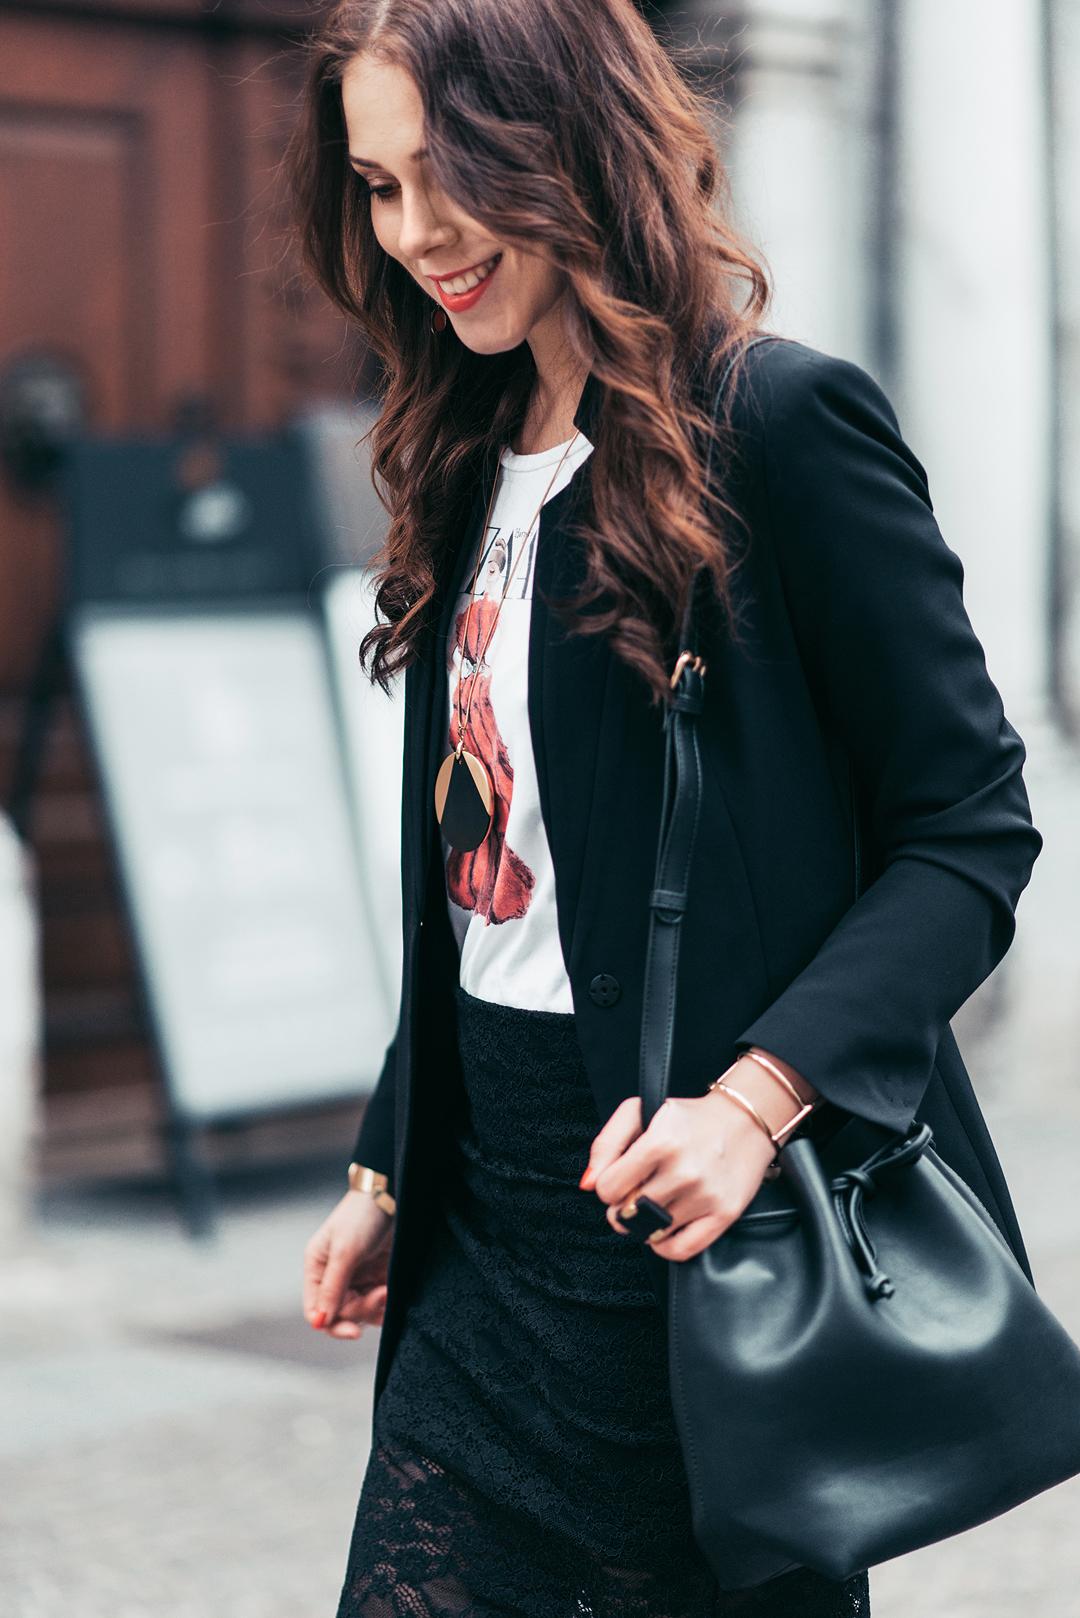 eva-ahacevcic_love-eva_ootd_six-accessories_zara-skirt_blazer_parfois-shoes_style_fashion-9